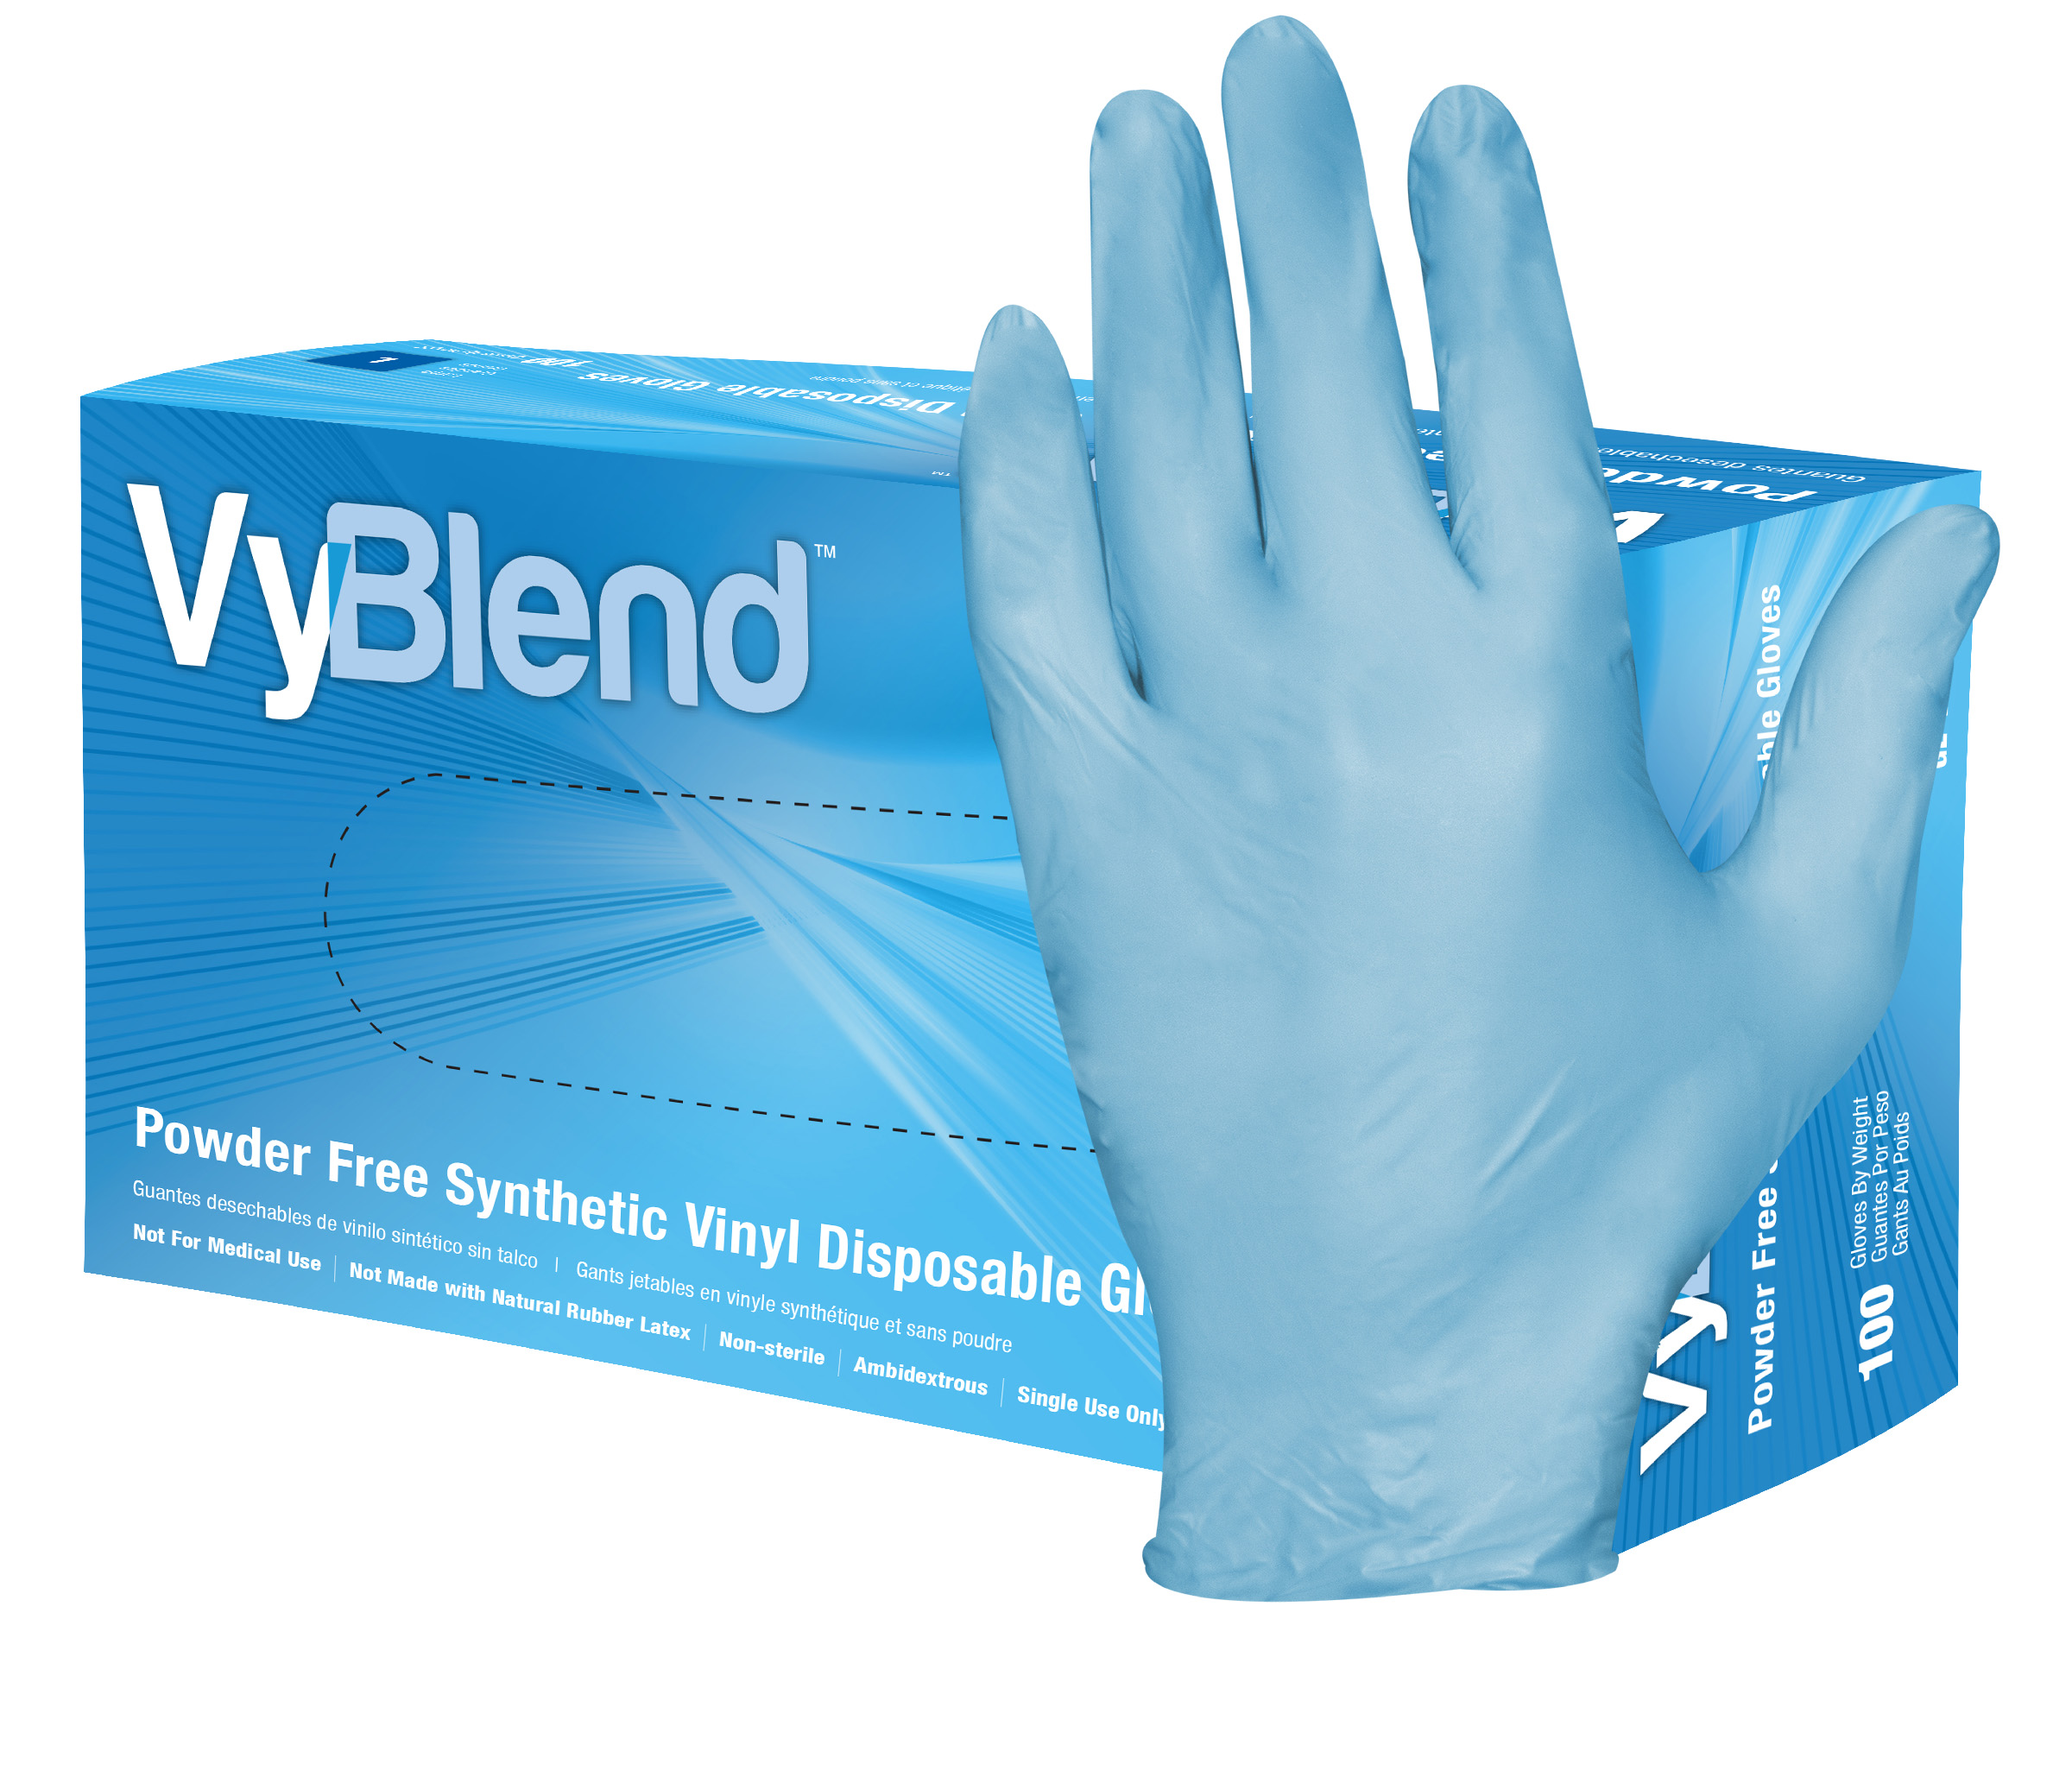 Hospeco VyBlend synthetic vinyl disposable gloves